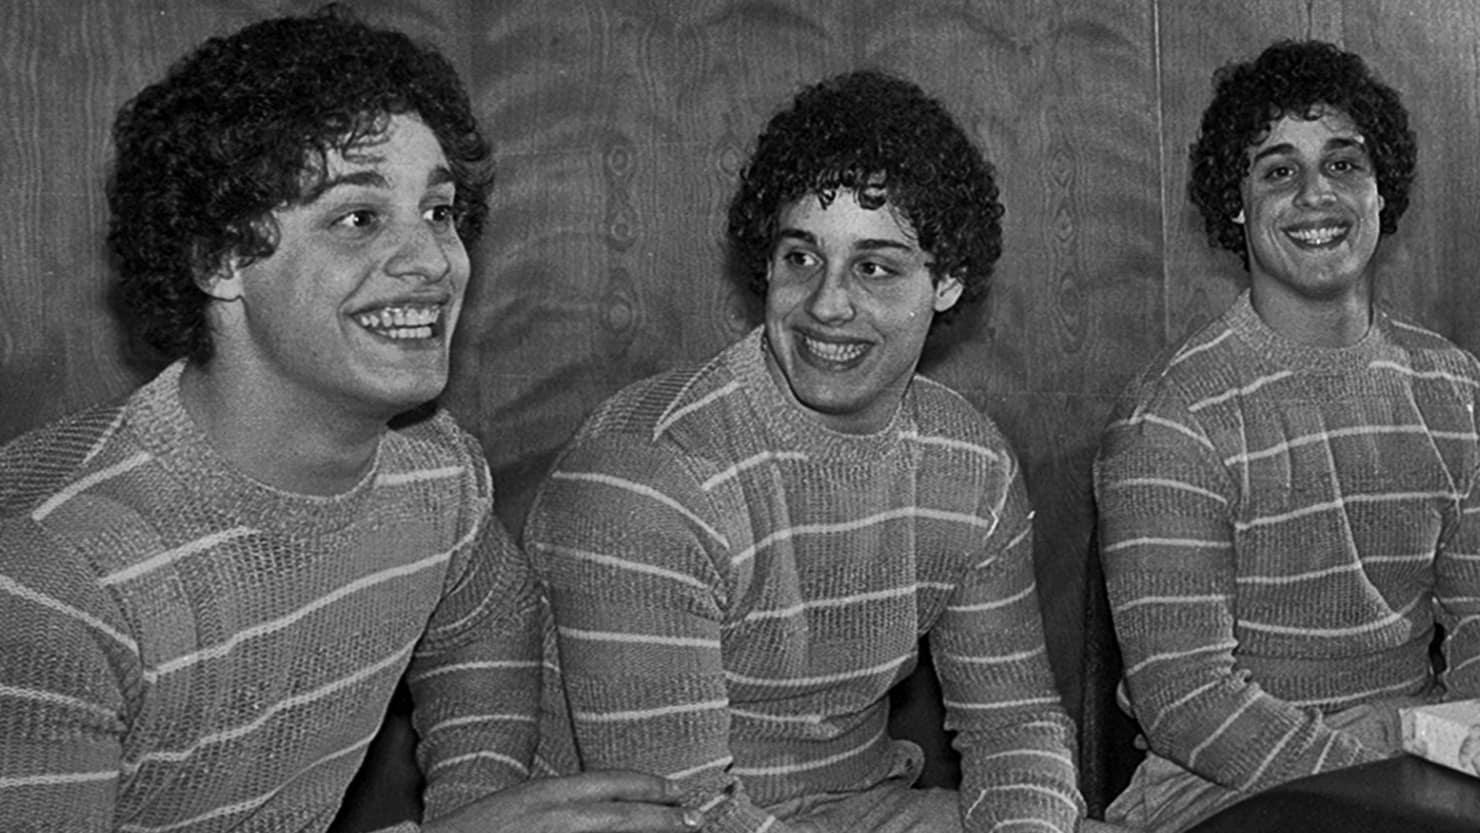 Triplets born 1961 adoption